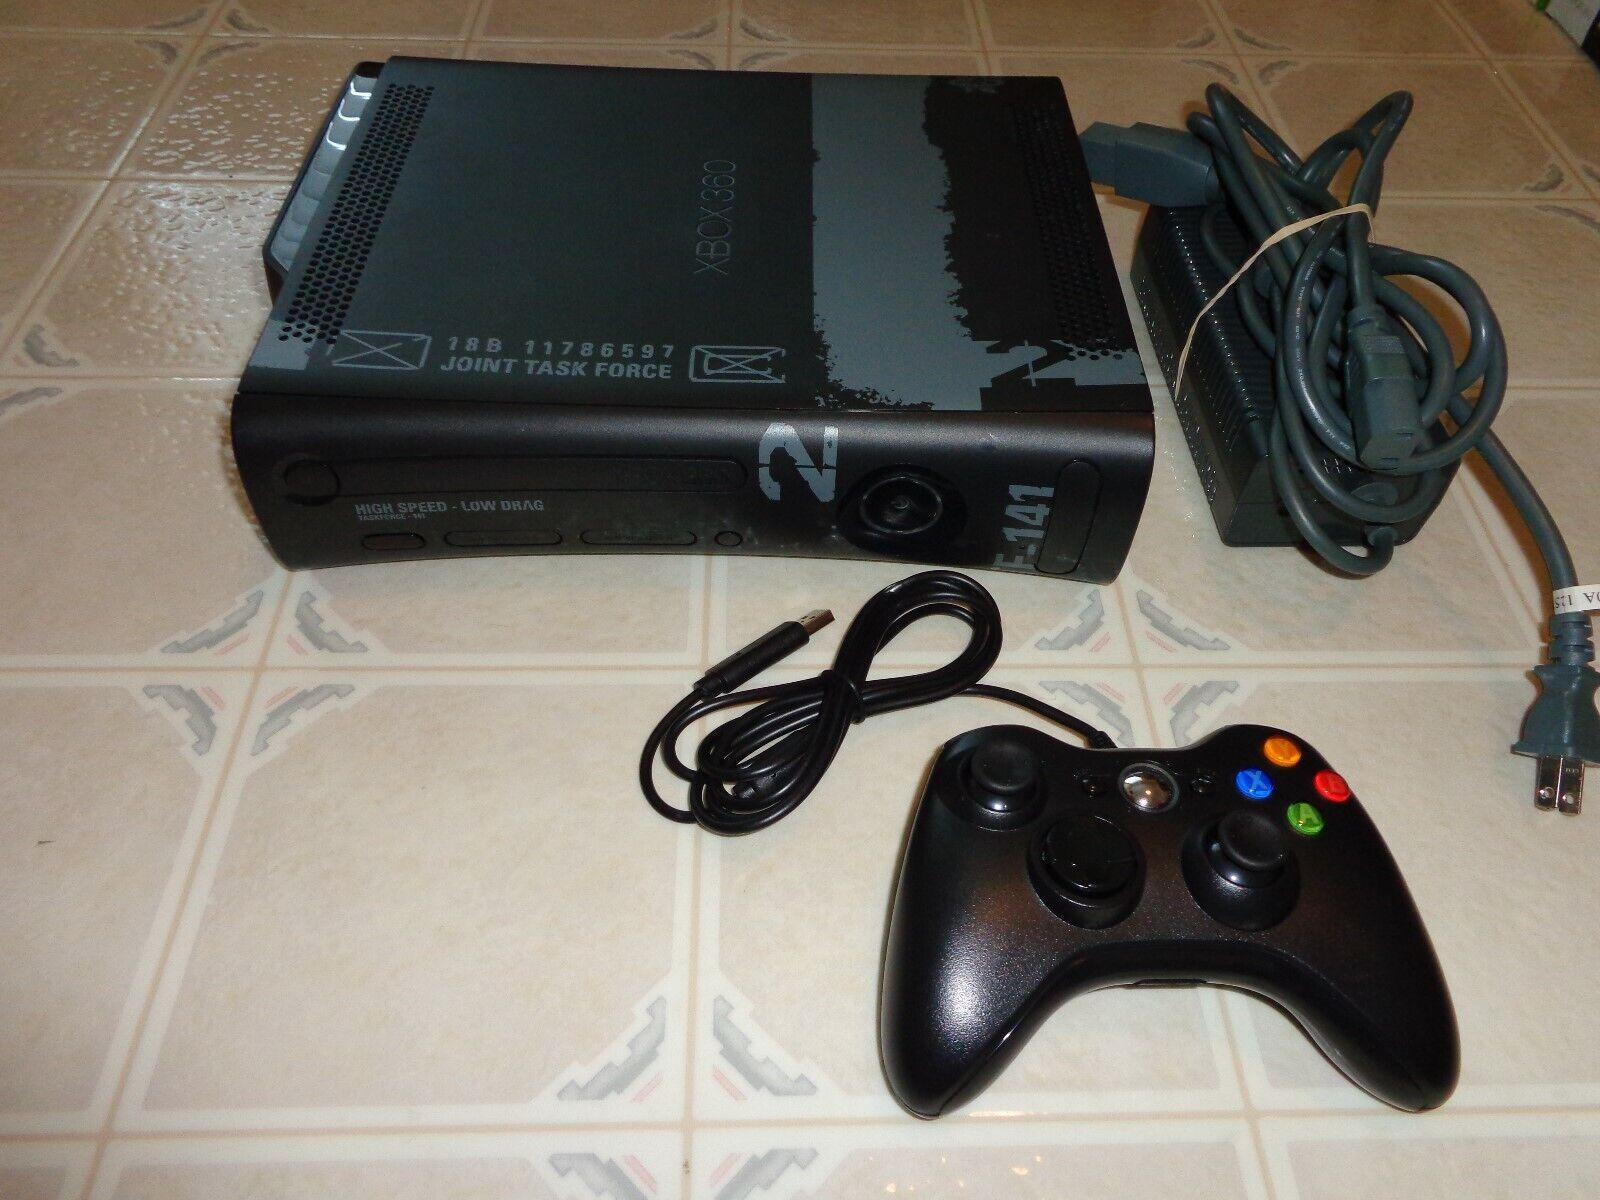 Microsoft Xbox 360 Elite Console 250GB - joint process..